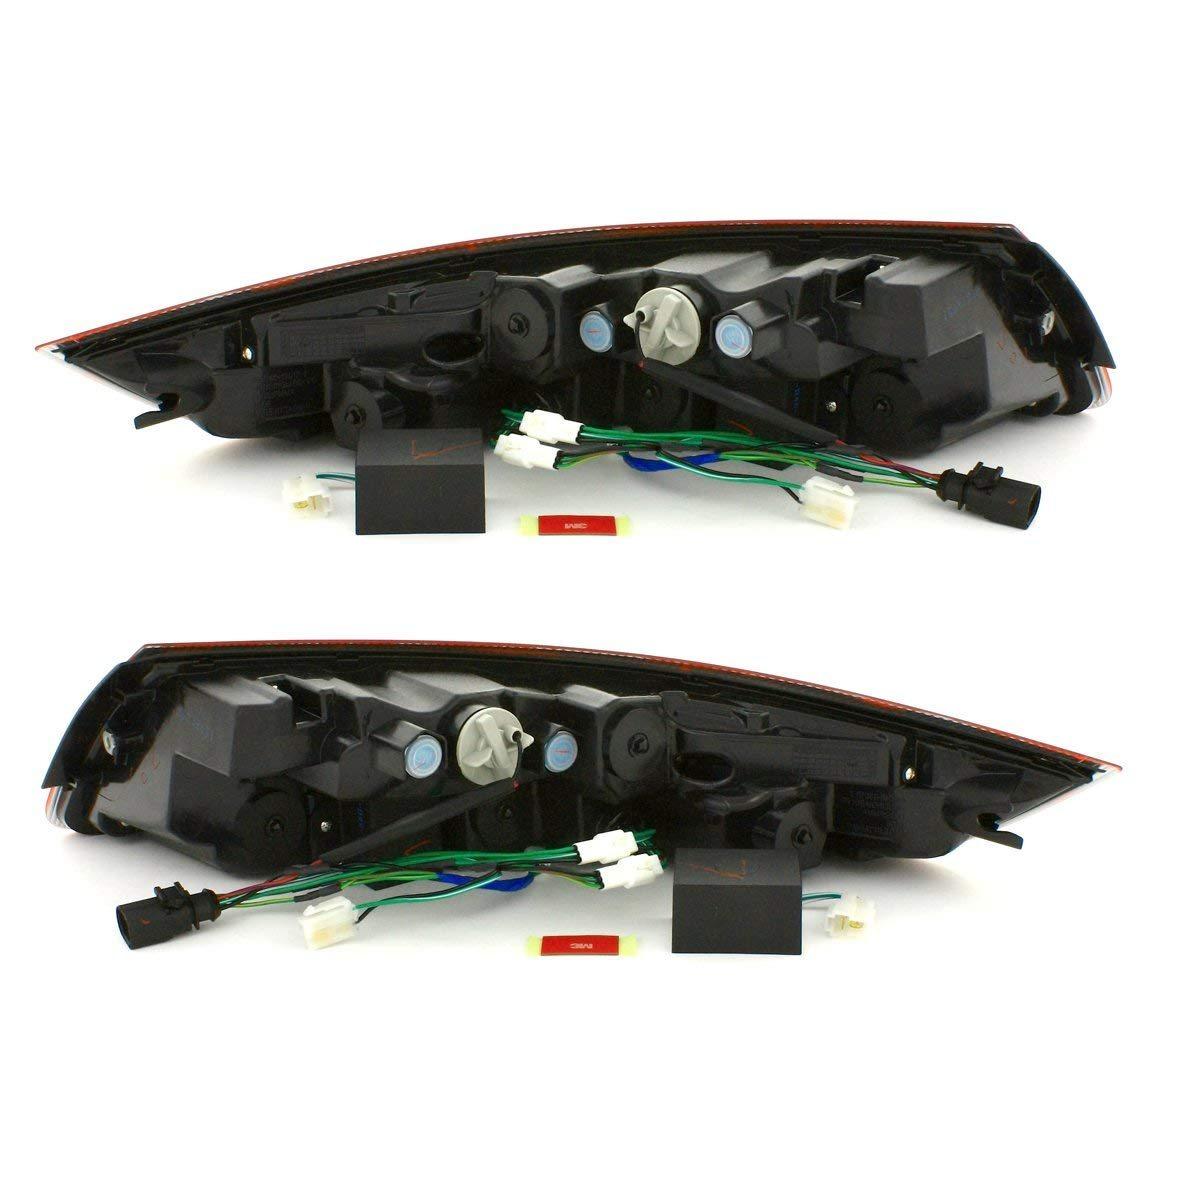 Porsche-911-04-08-–-Farolins-Cristal-em-LED-2